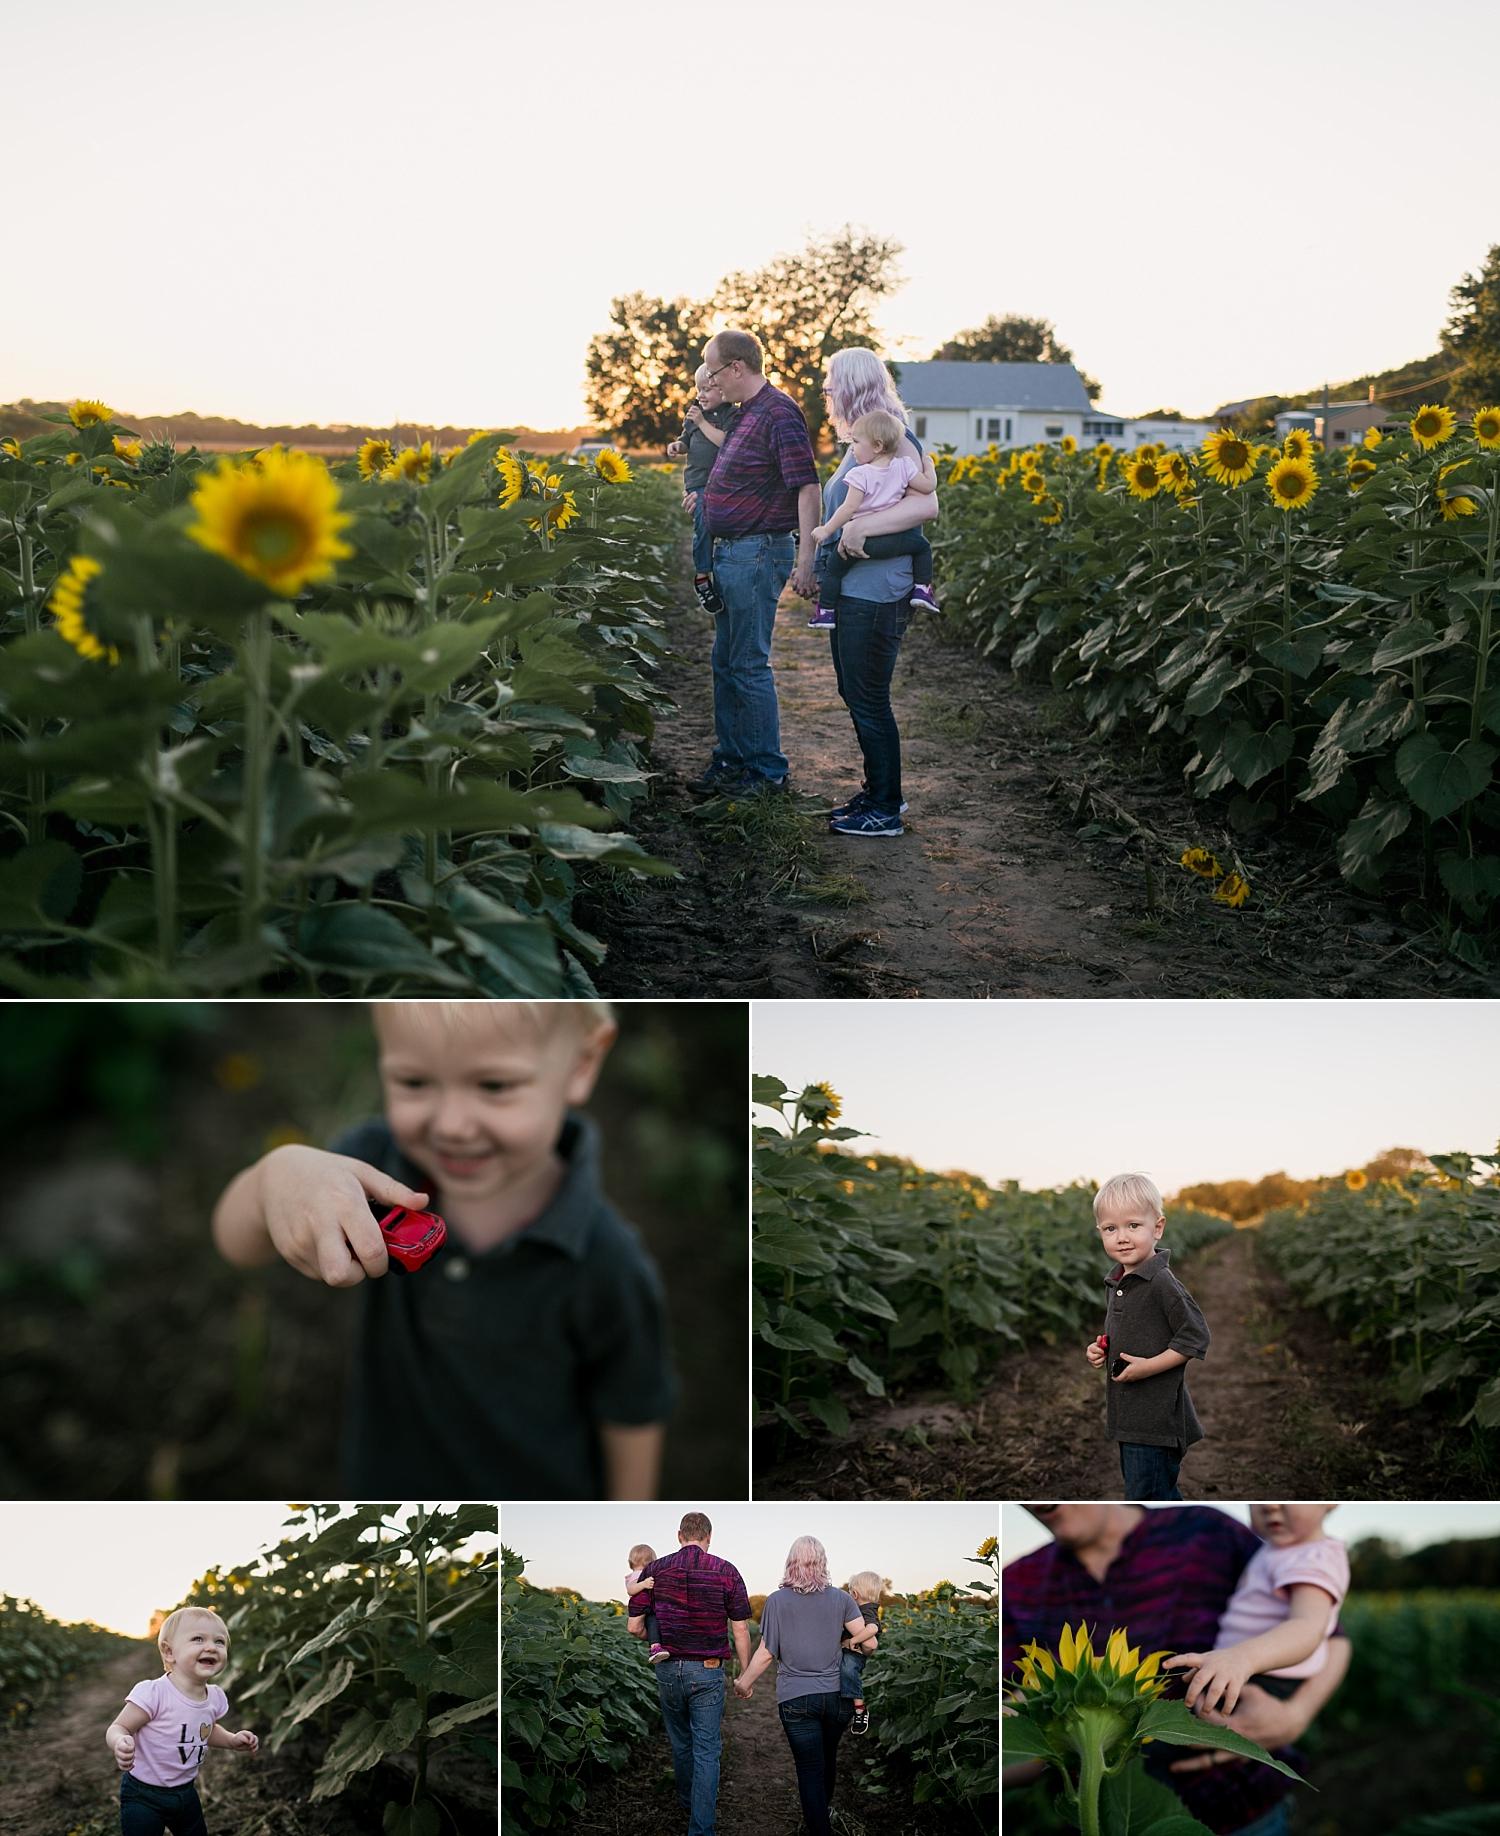 Britts-Farm-Family-of-four-Sunflower-Mini-Photo-Session-Manhattan-KS